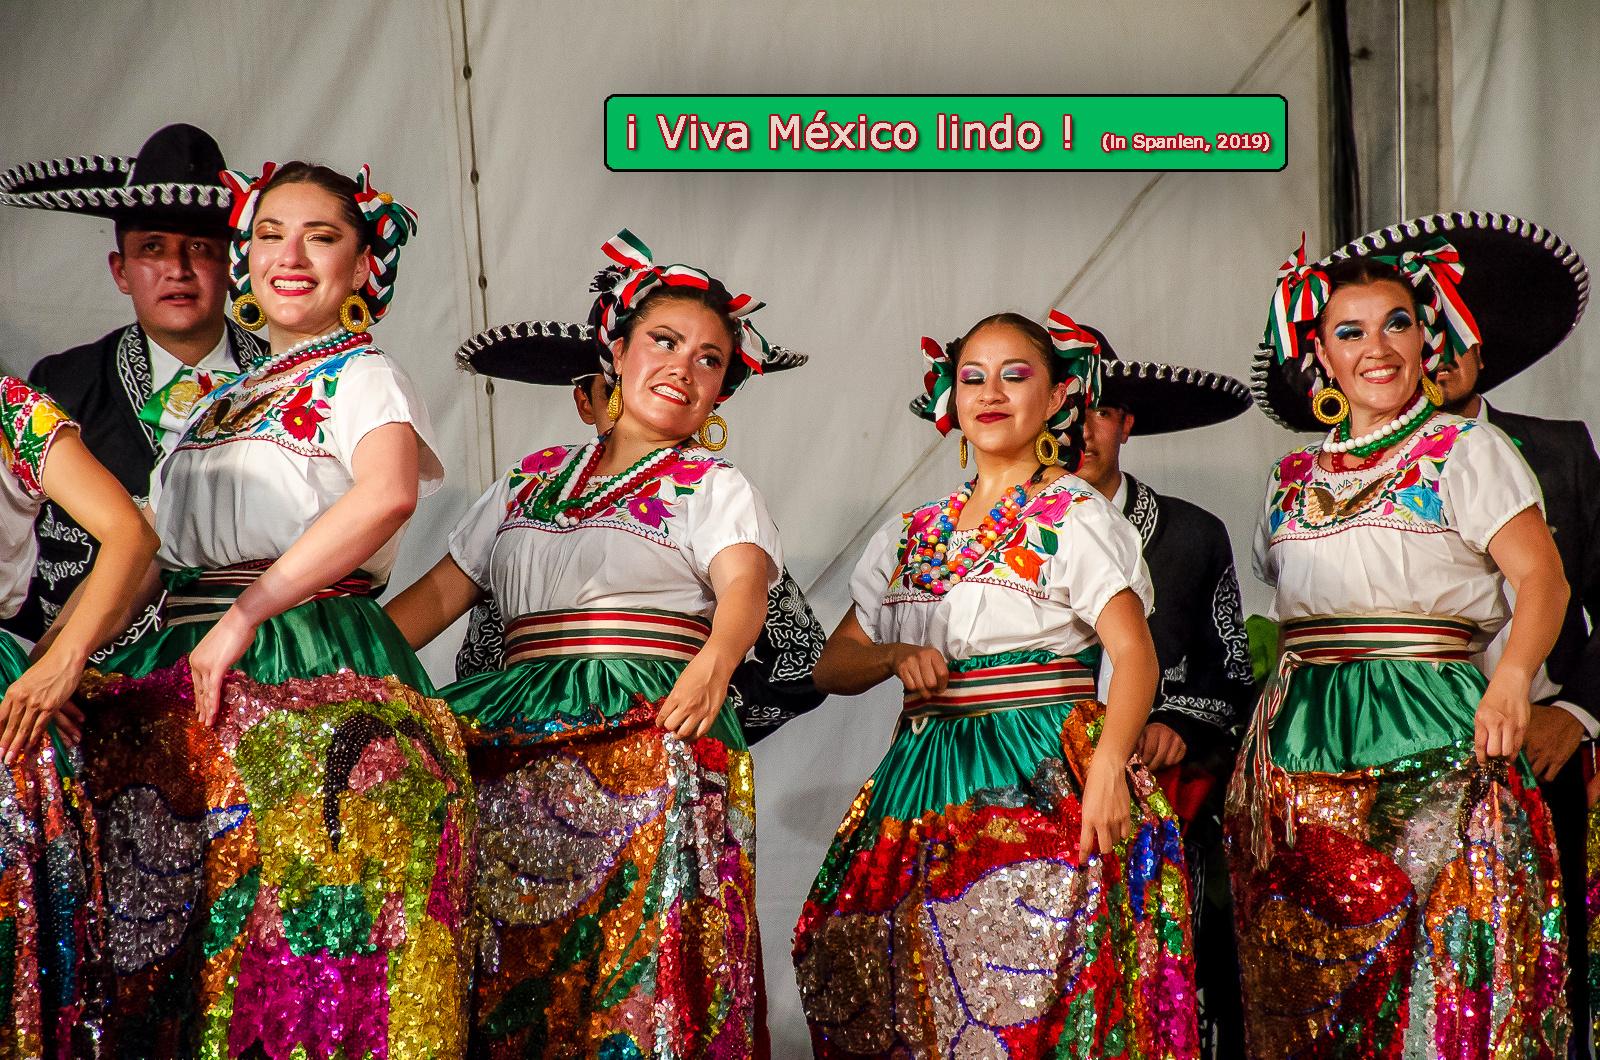 ¡Viva México lindo!